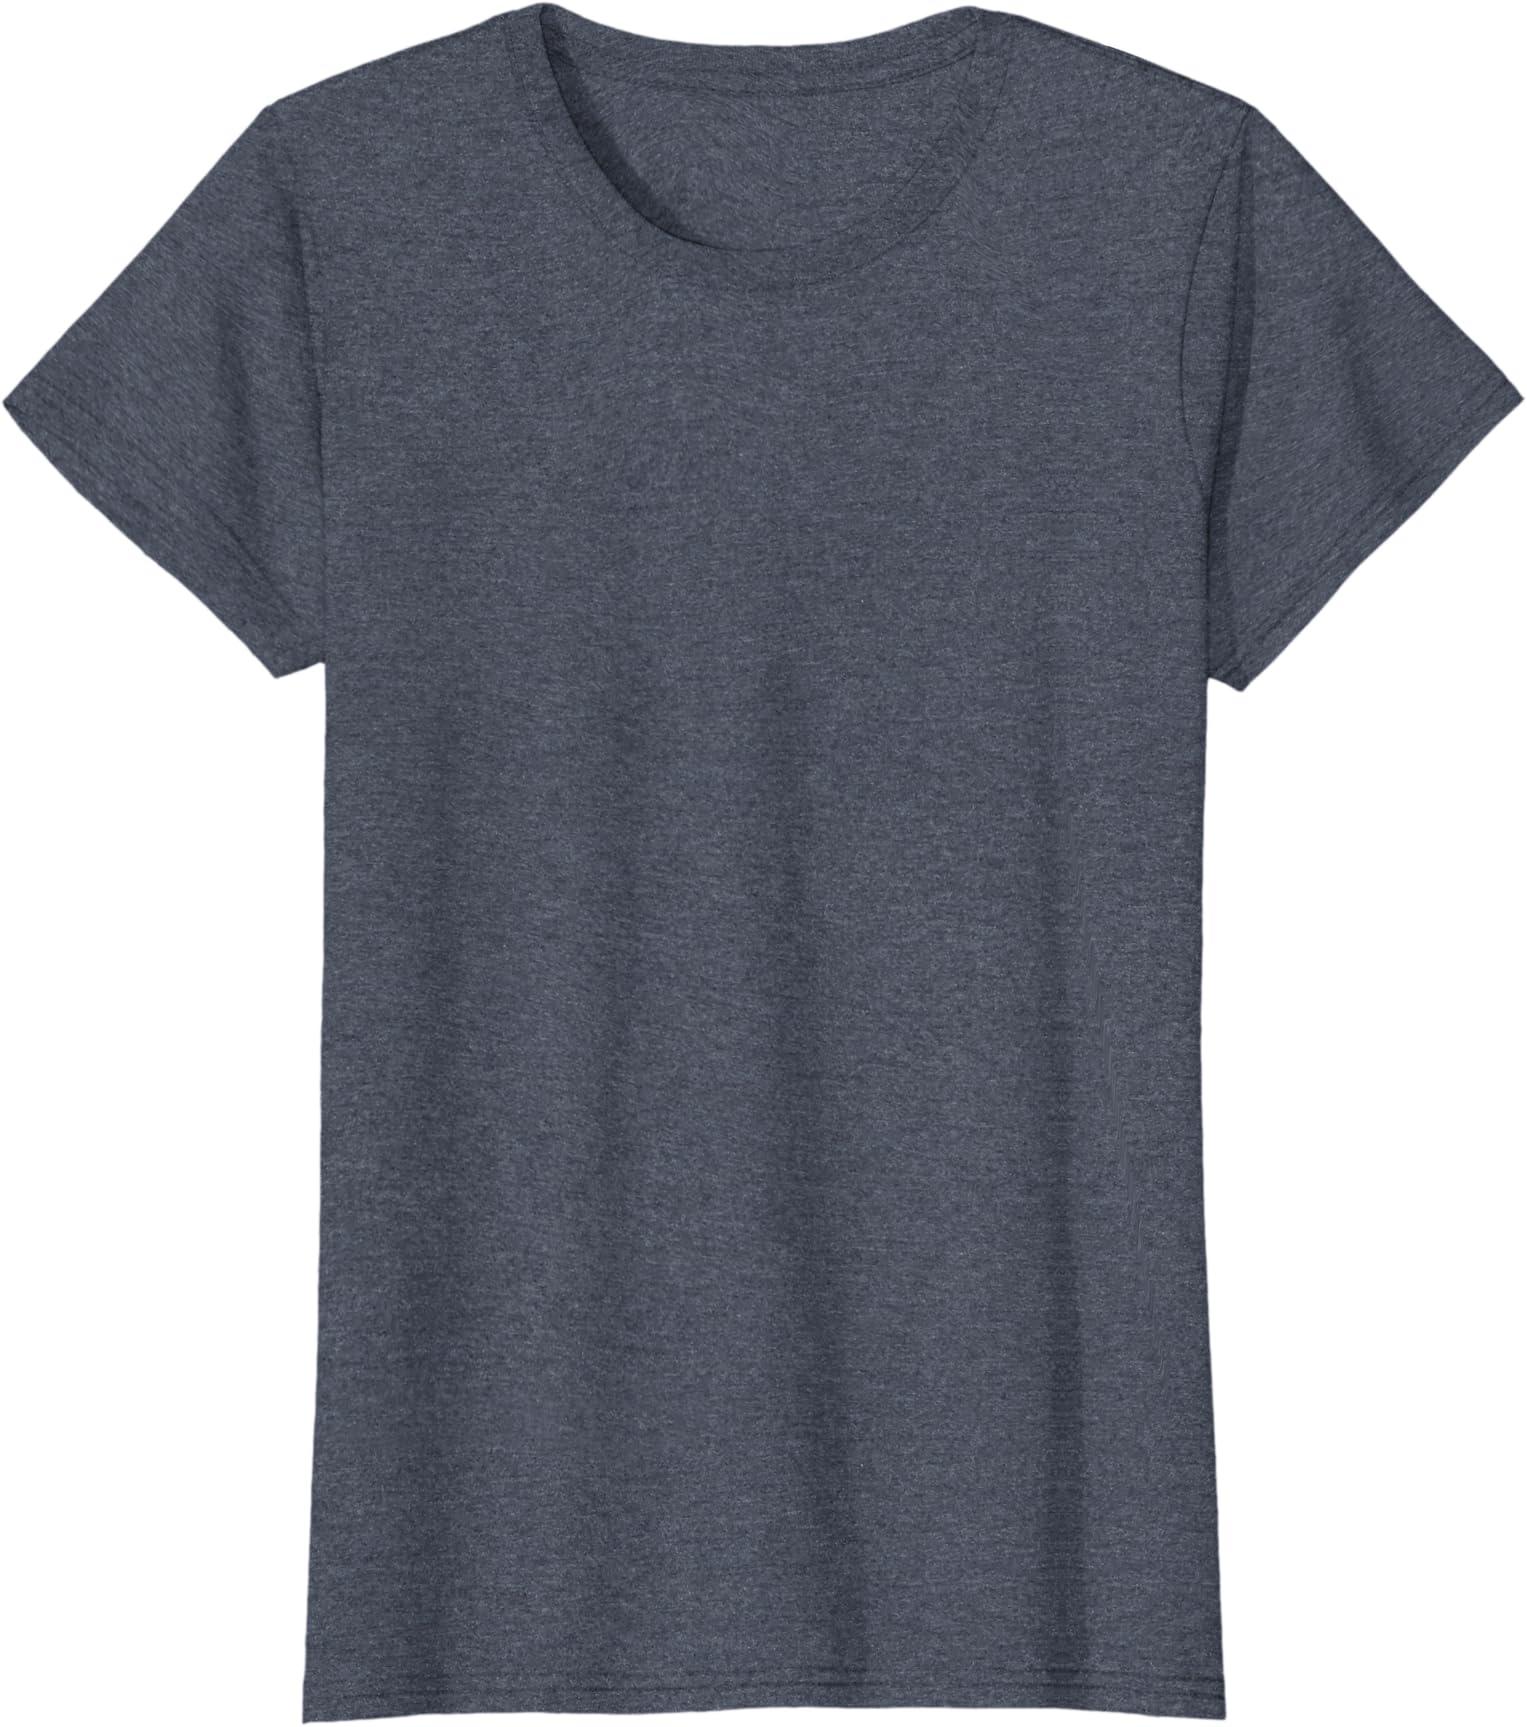 Barcelona City Long Sleeve Vintage T-shirt